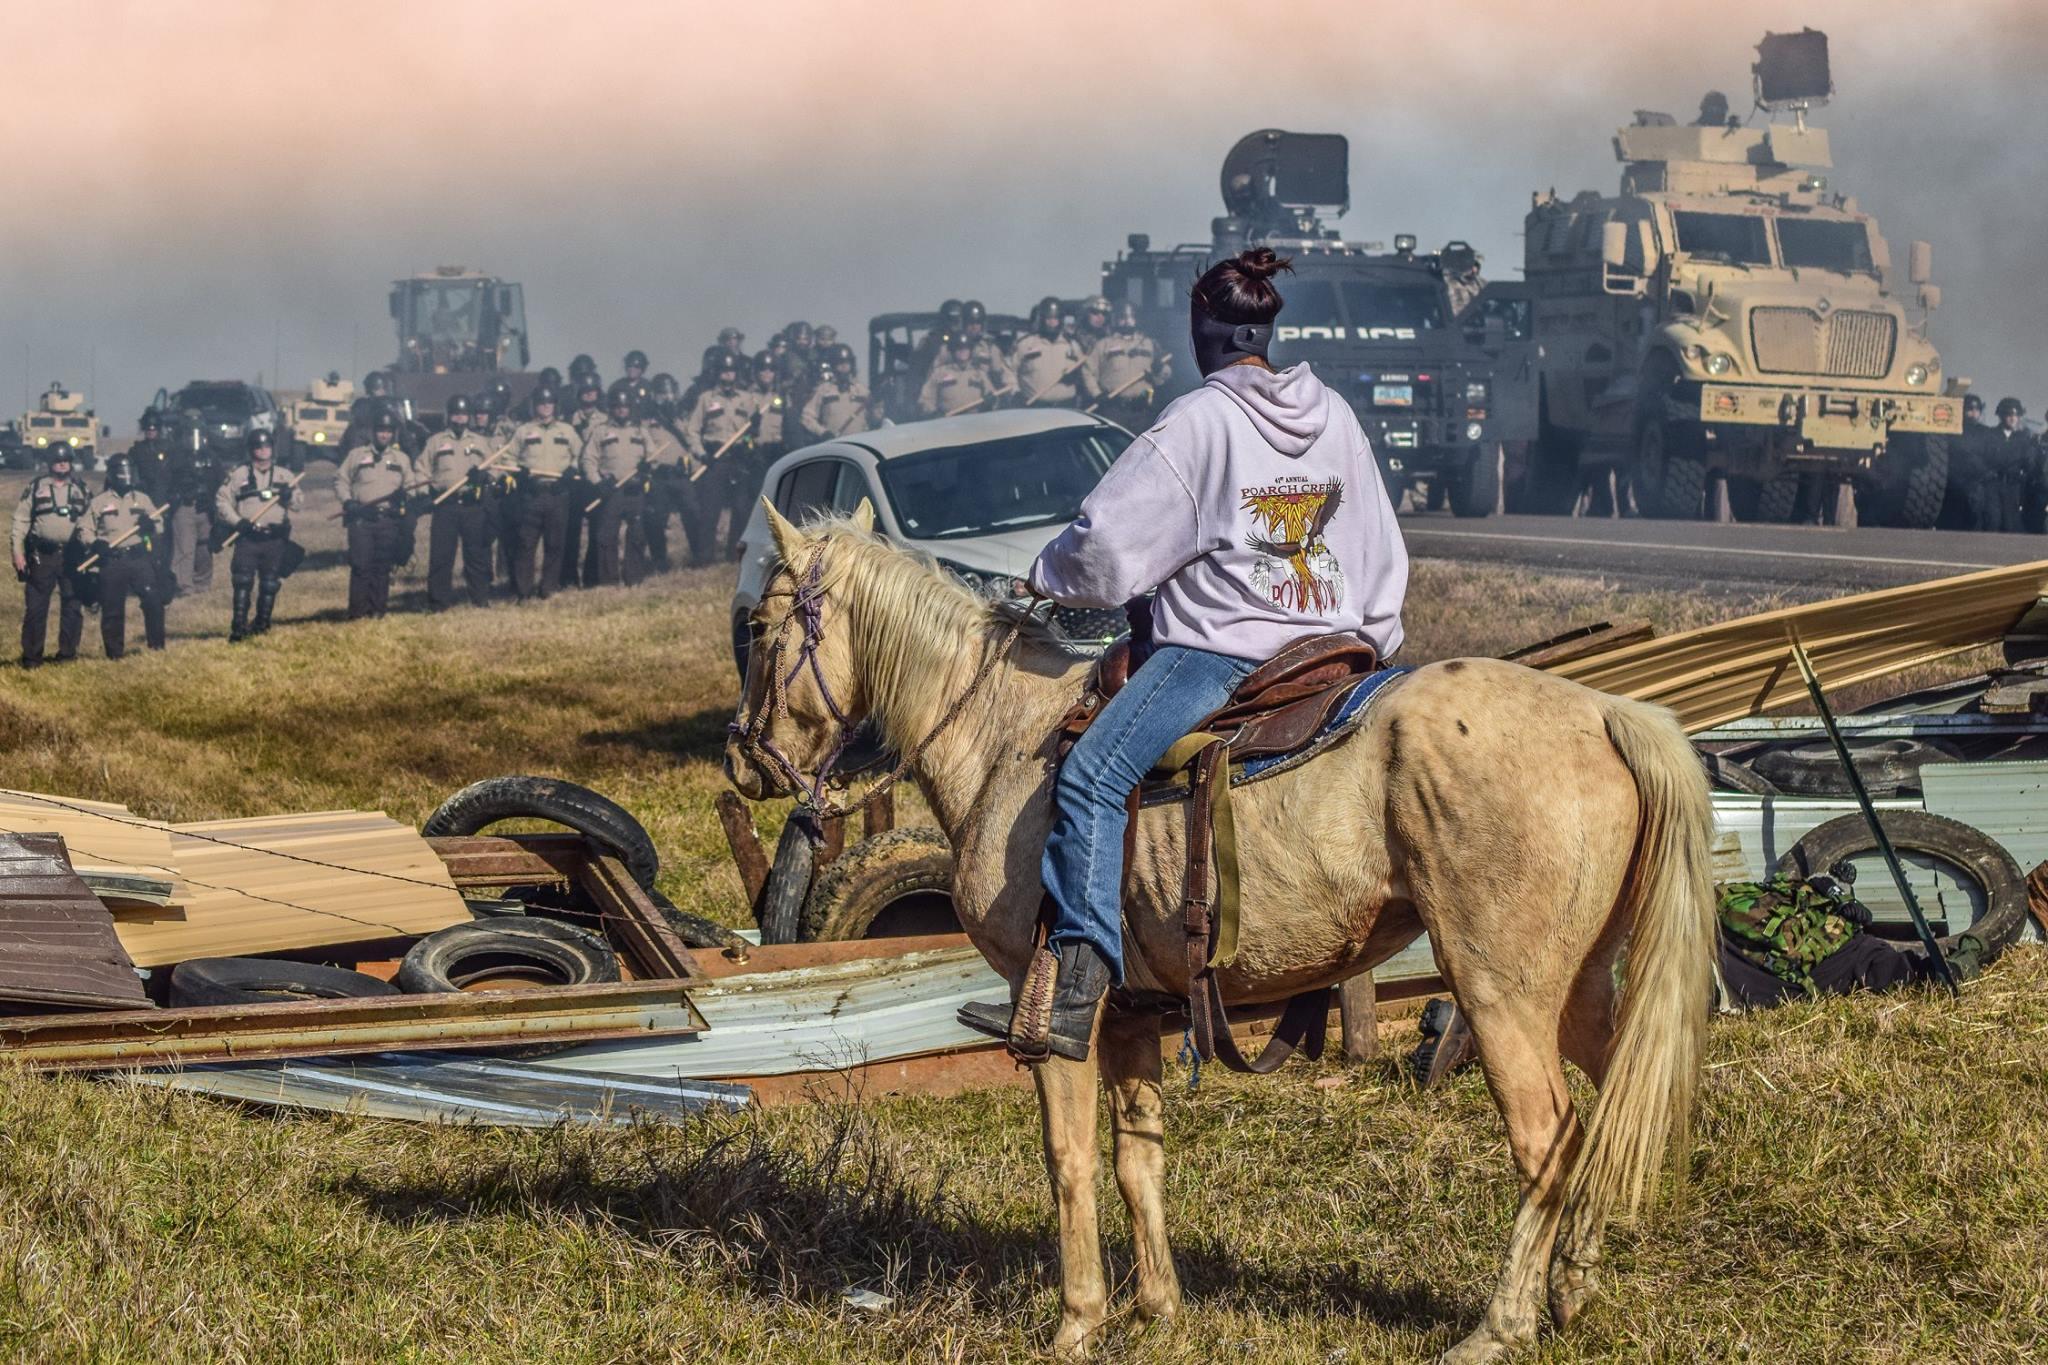 Redhawk/Standing Rock Rising